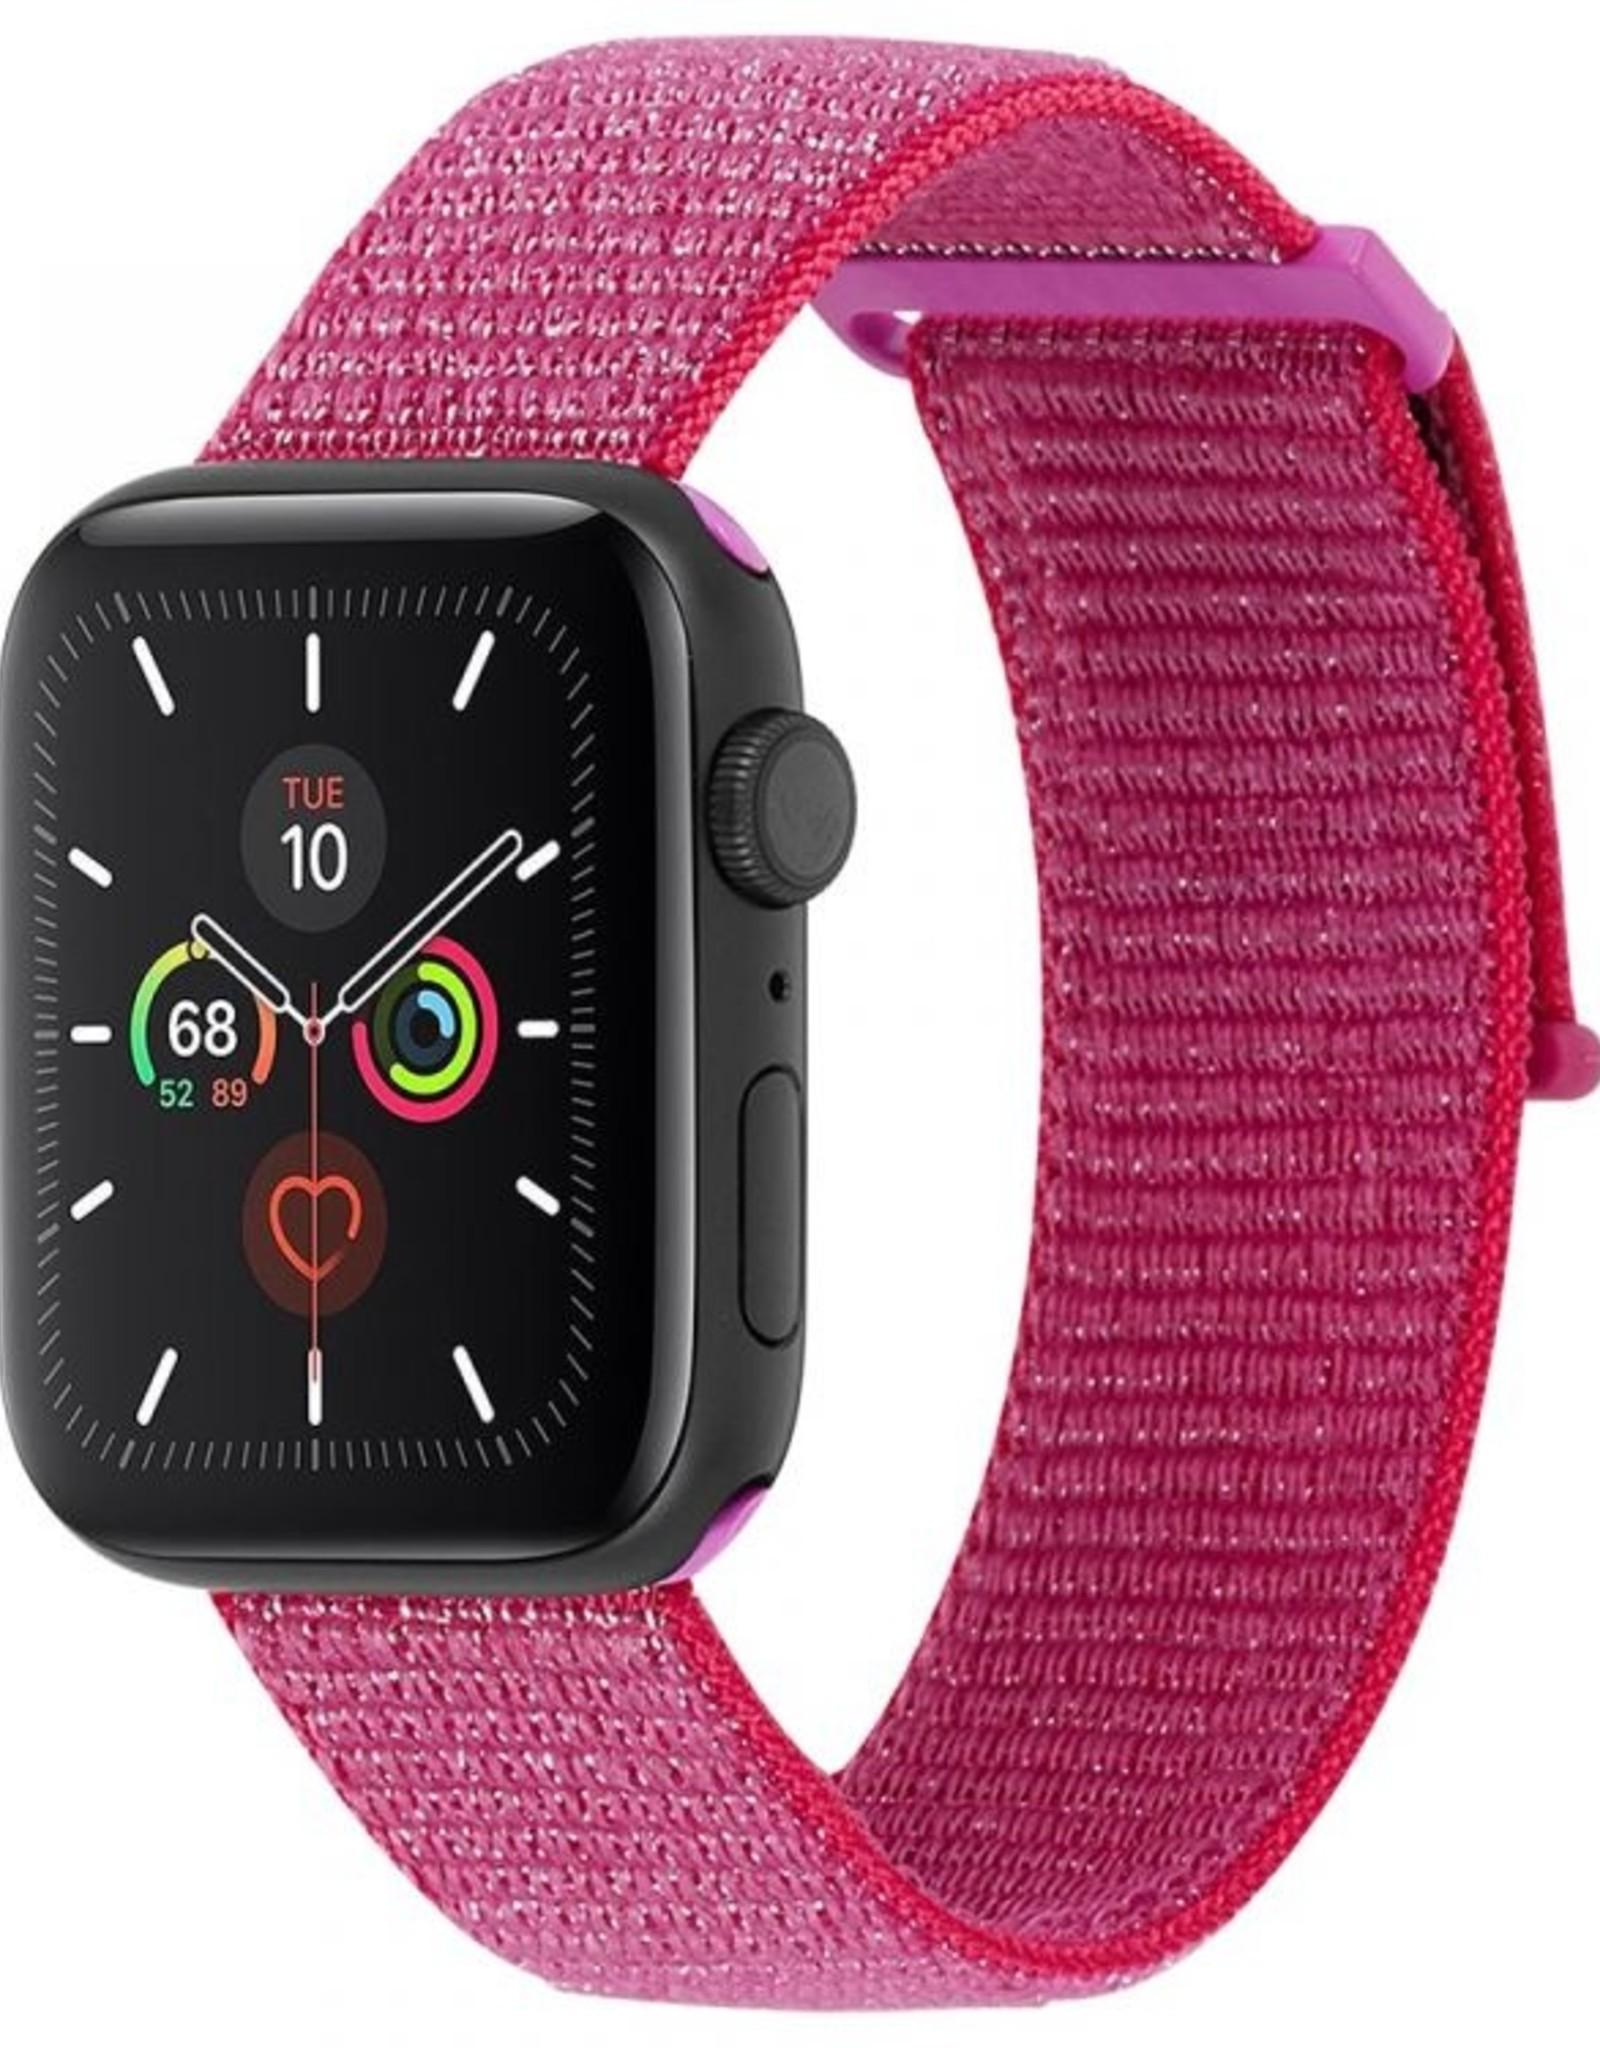 Case-Mate Case-Mate   Apple Watch (Series 1,2,3,4,5) 38/40mm Metallic Pink Nylon Band15-06495